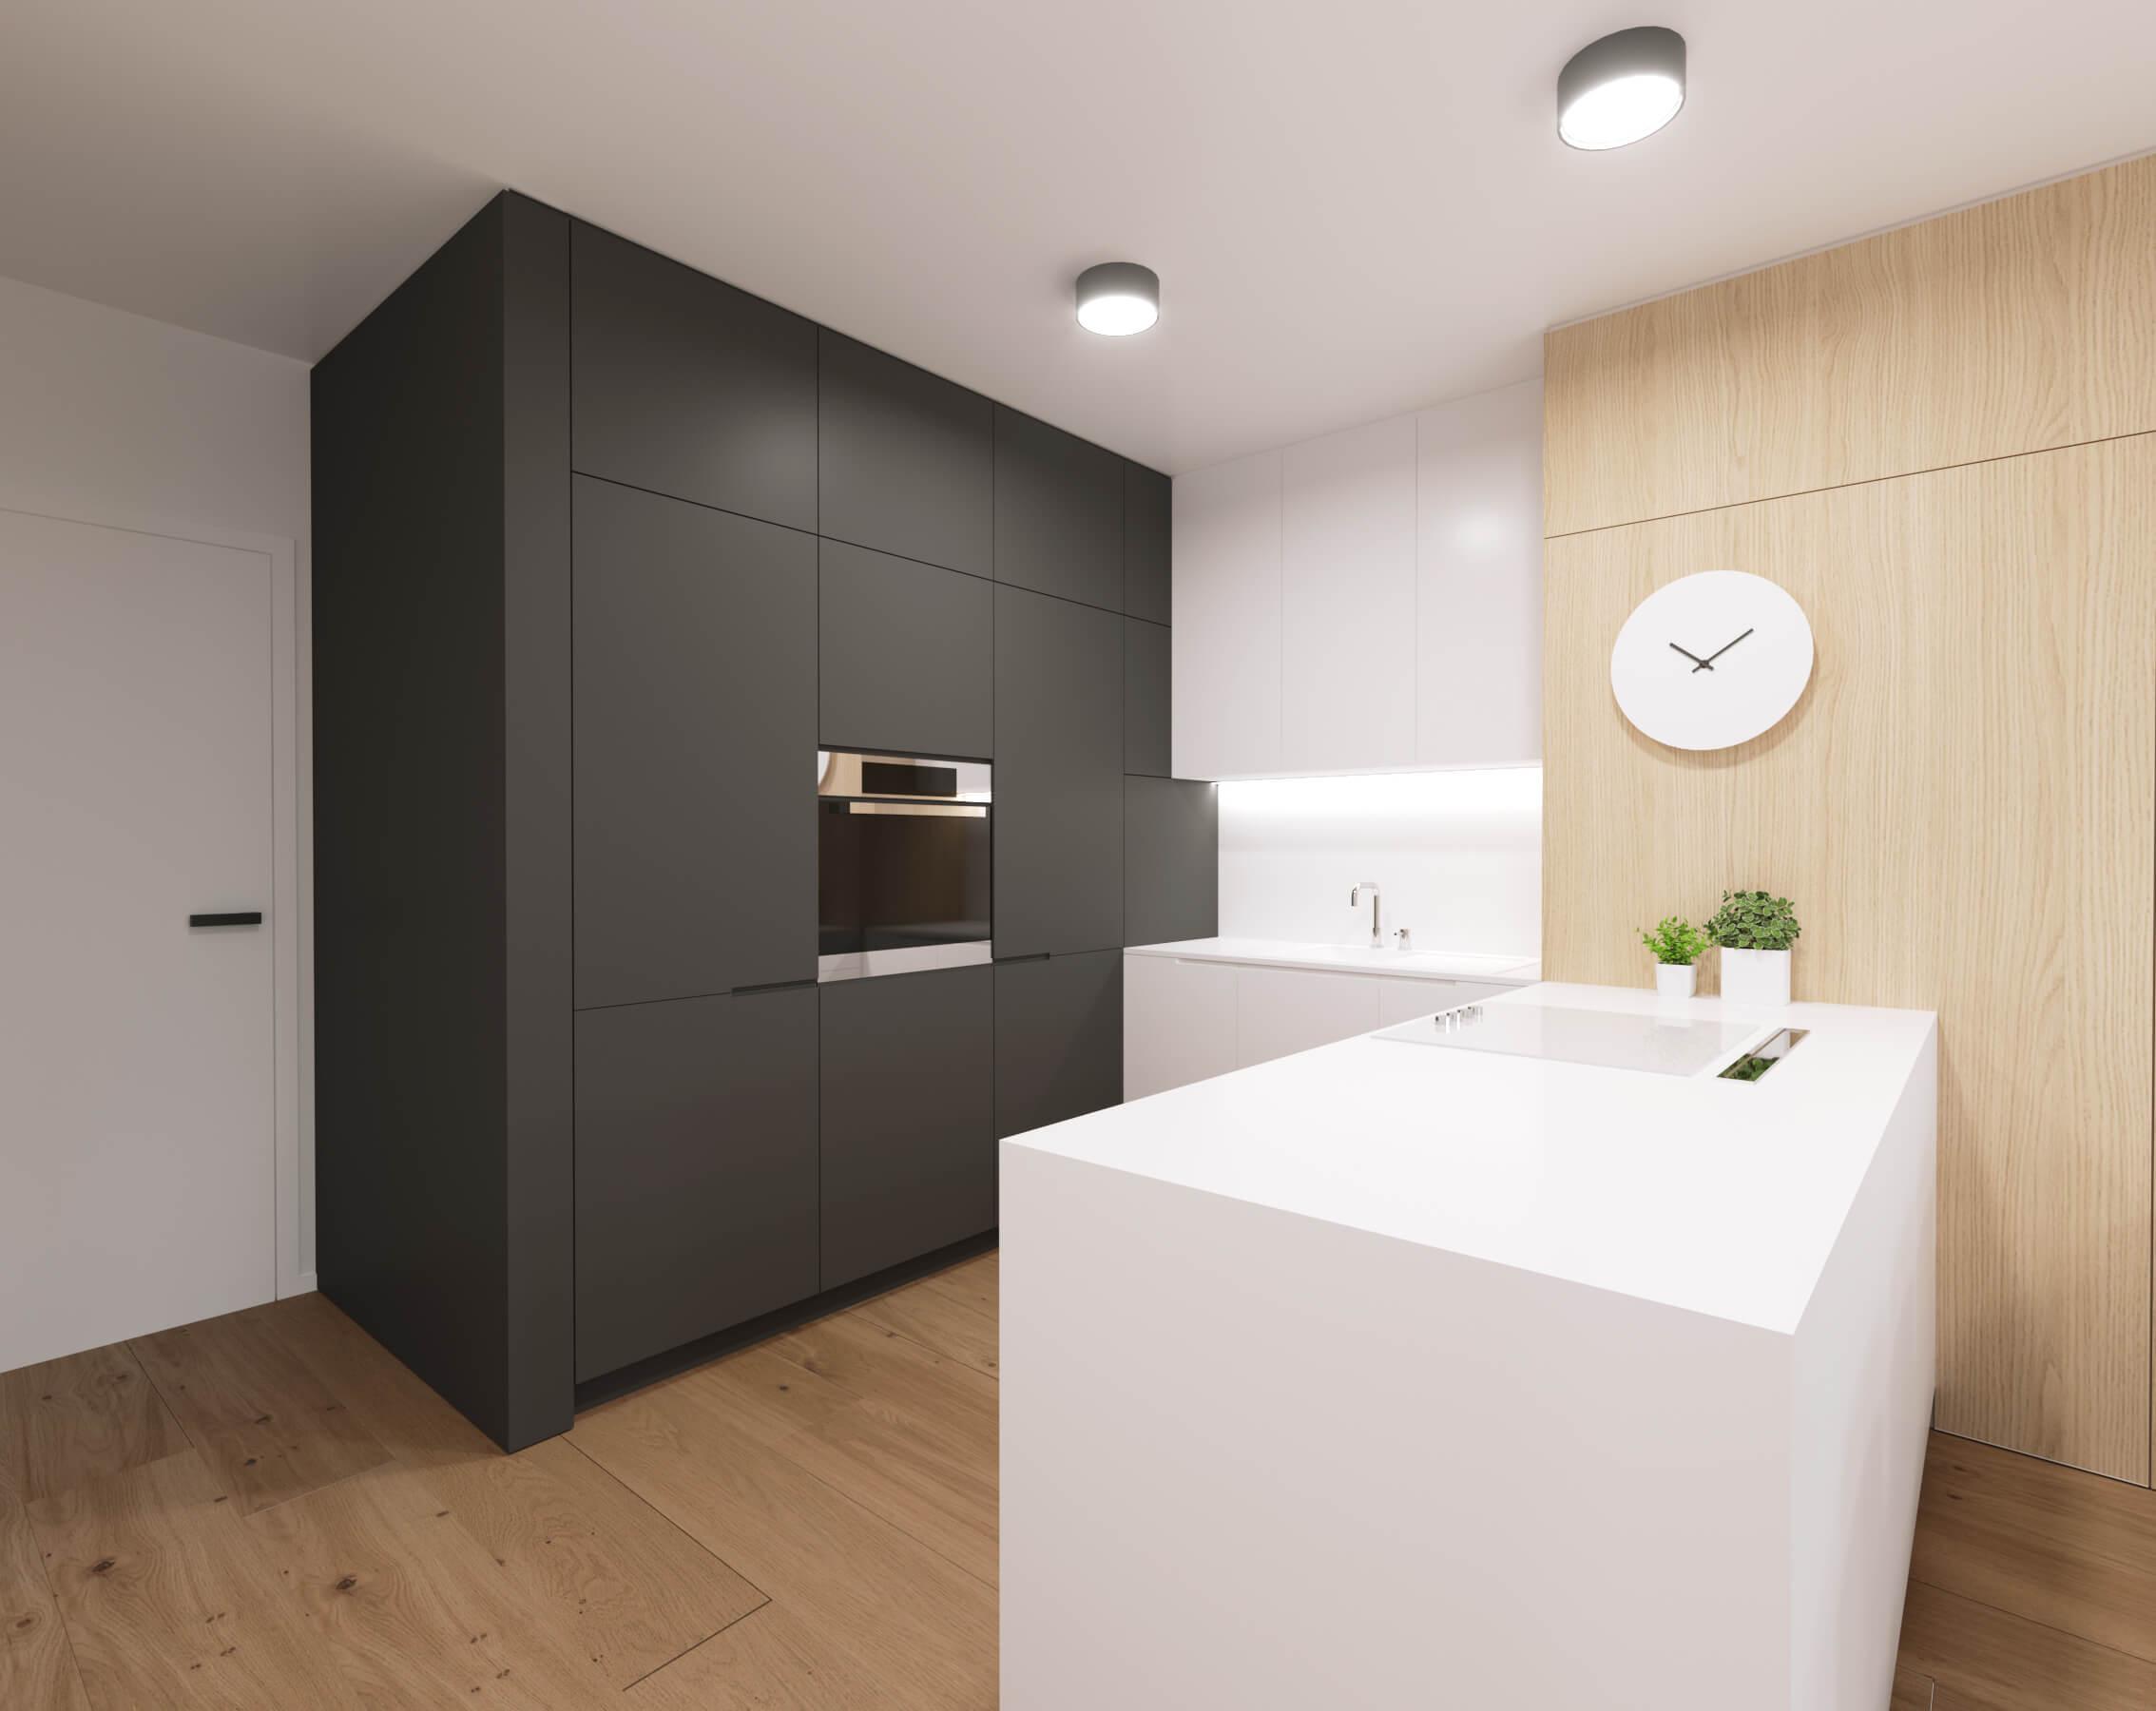 01_kuchyna